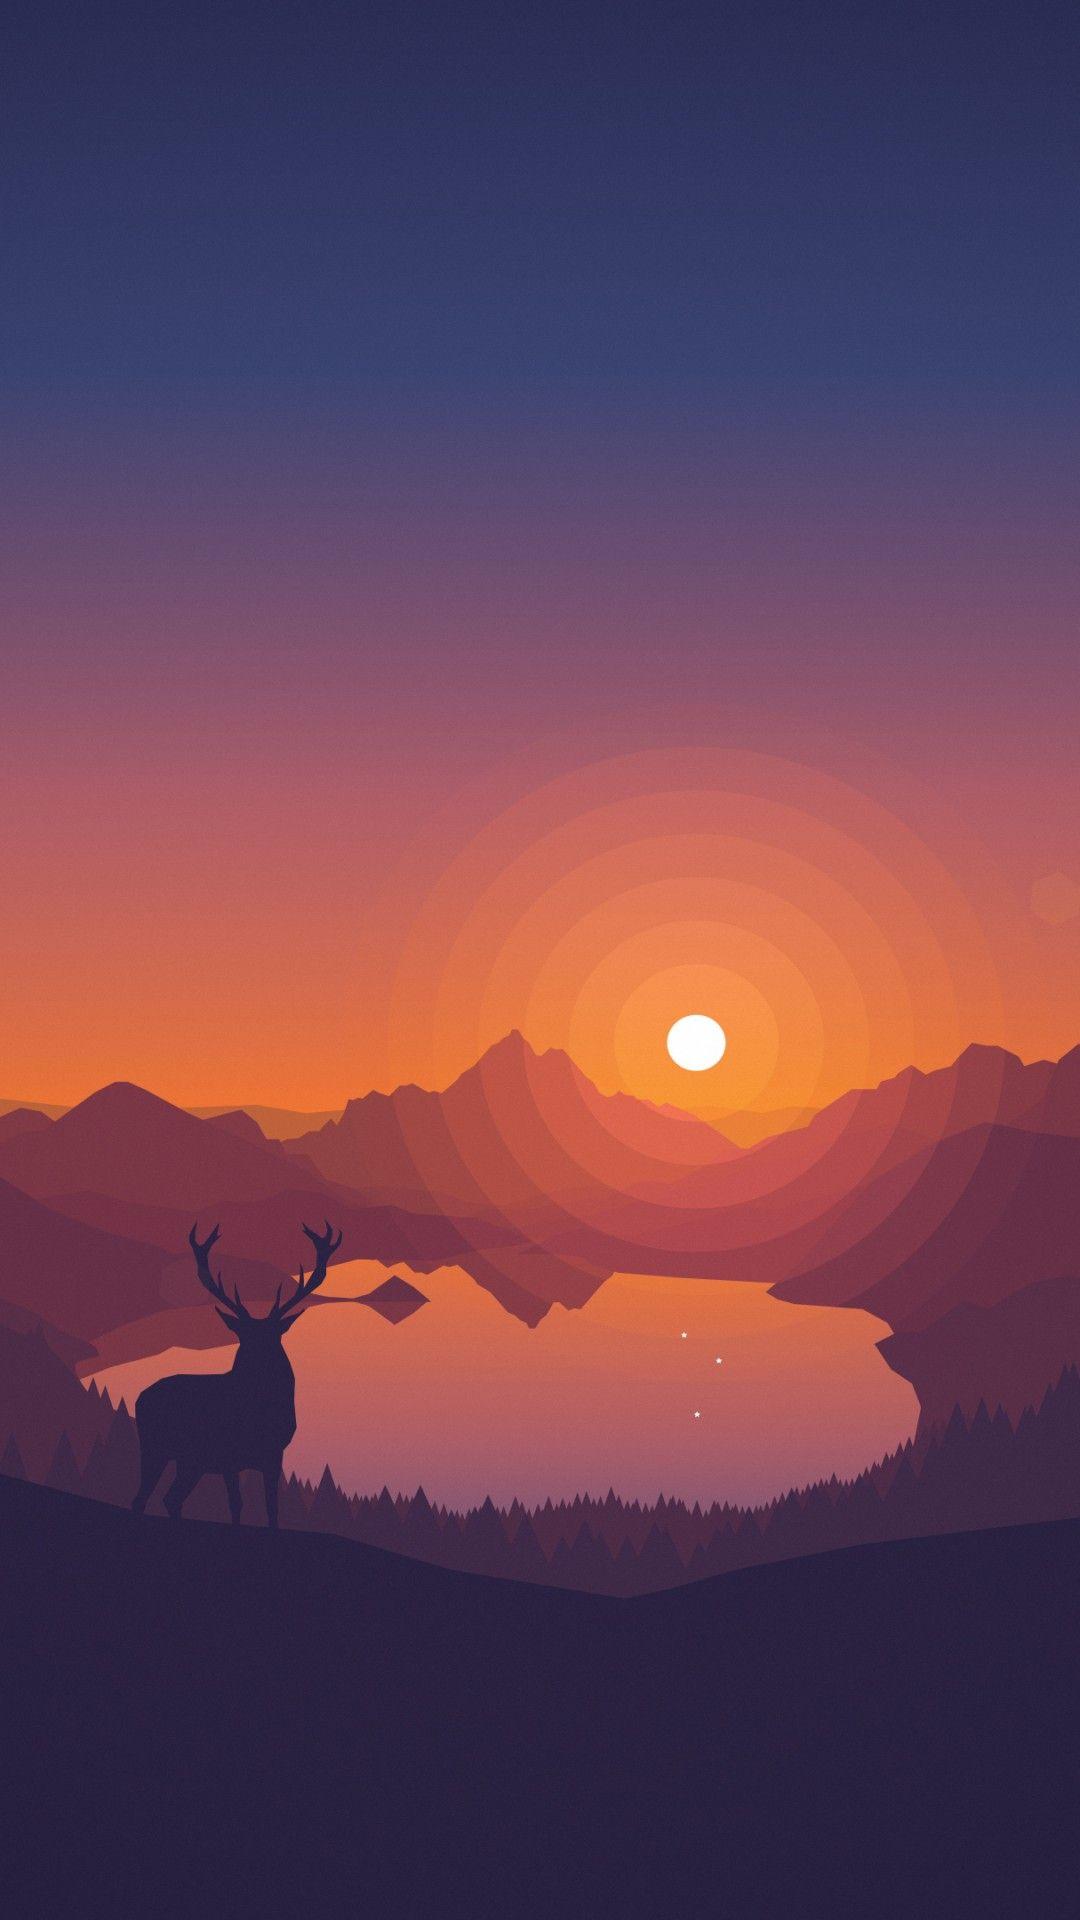 Misc Lakeview Sunset 4k Wallpapers Red Dead Redemption Art Minimalist Wallpaper Deer Wallpaper